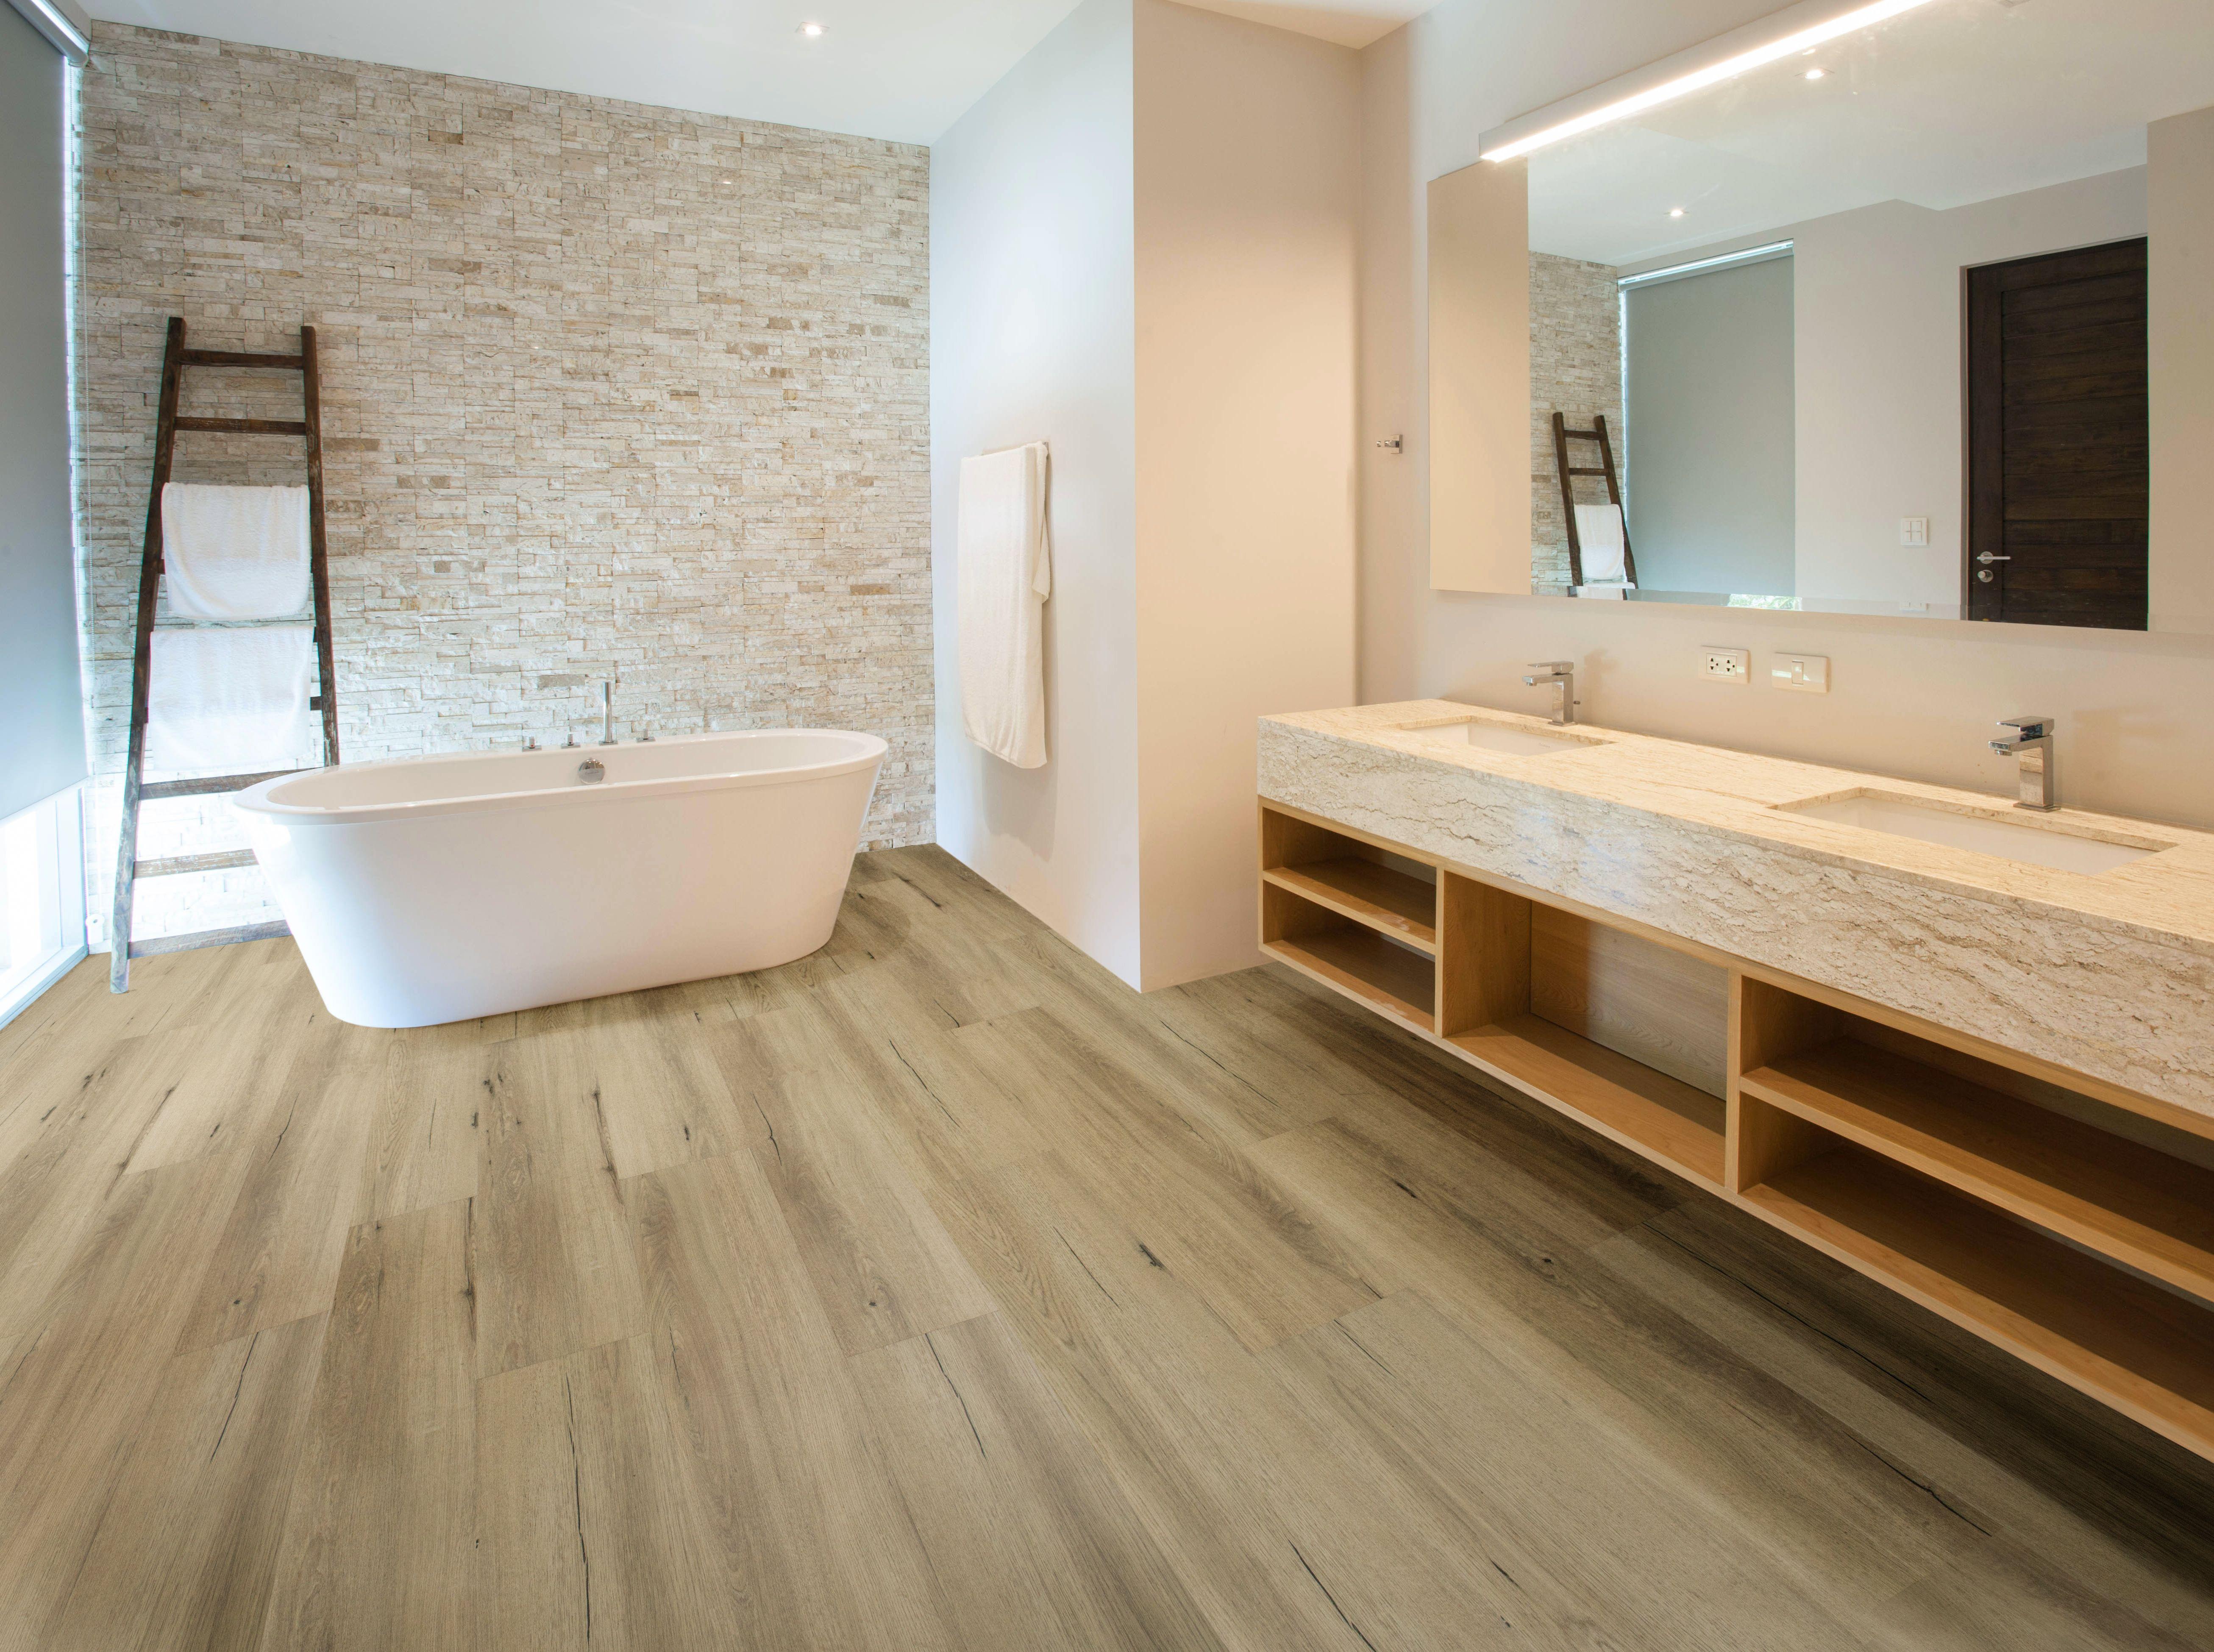 Firmfit Sea Breeze Vinyl Wood Flooring Luxury Vinyl Flooring Water Resistant Flooring